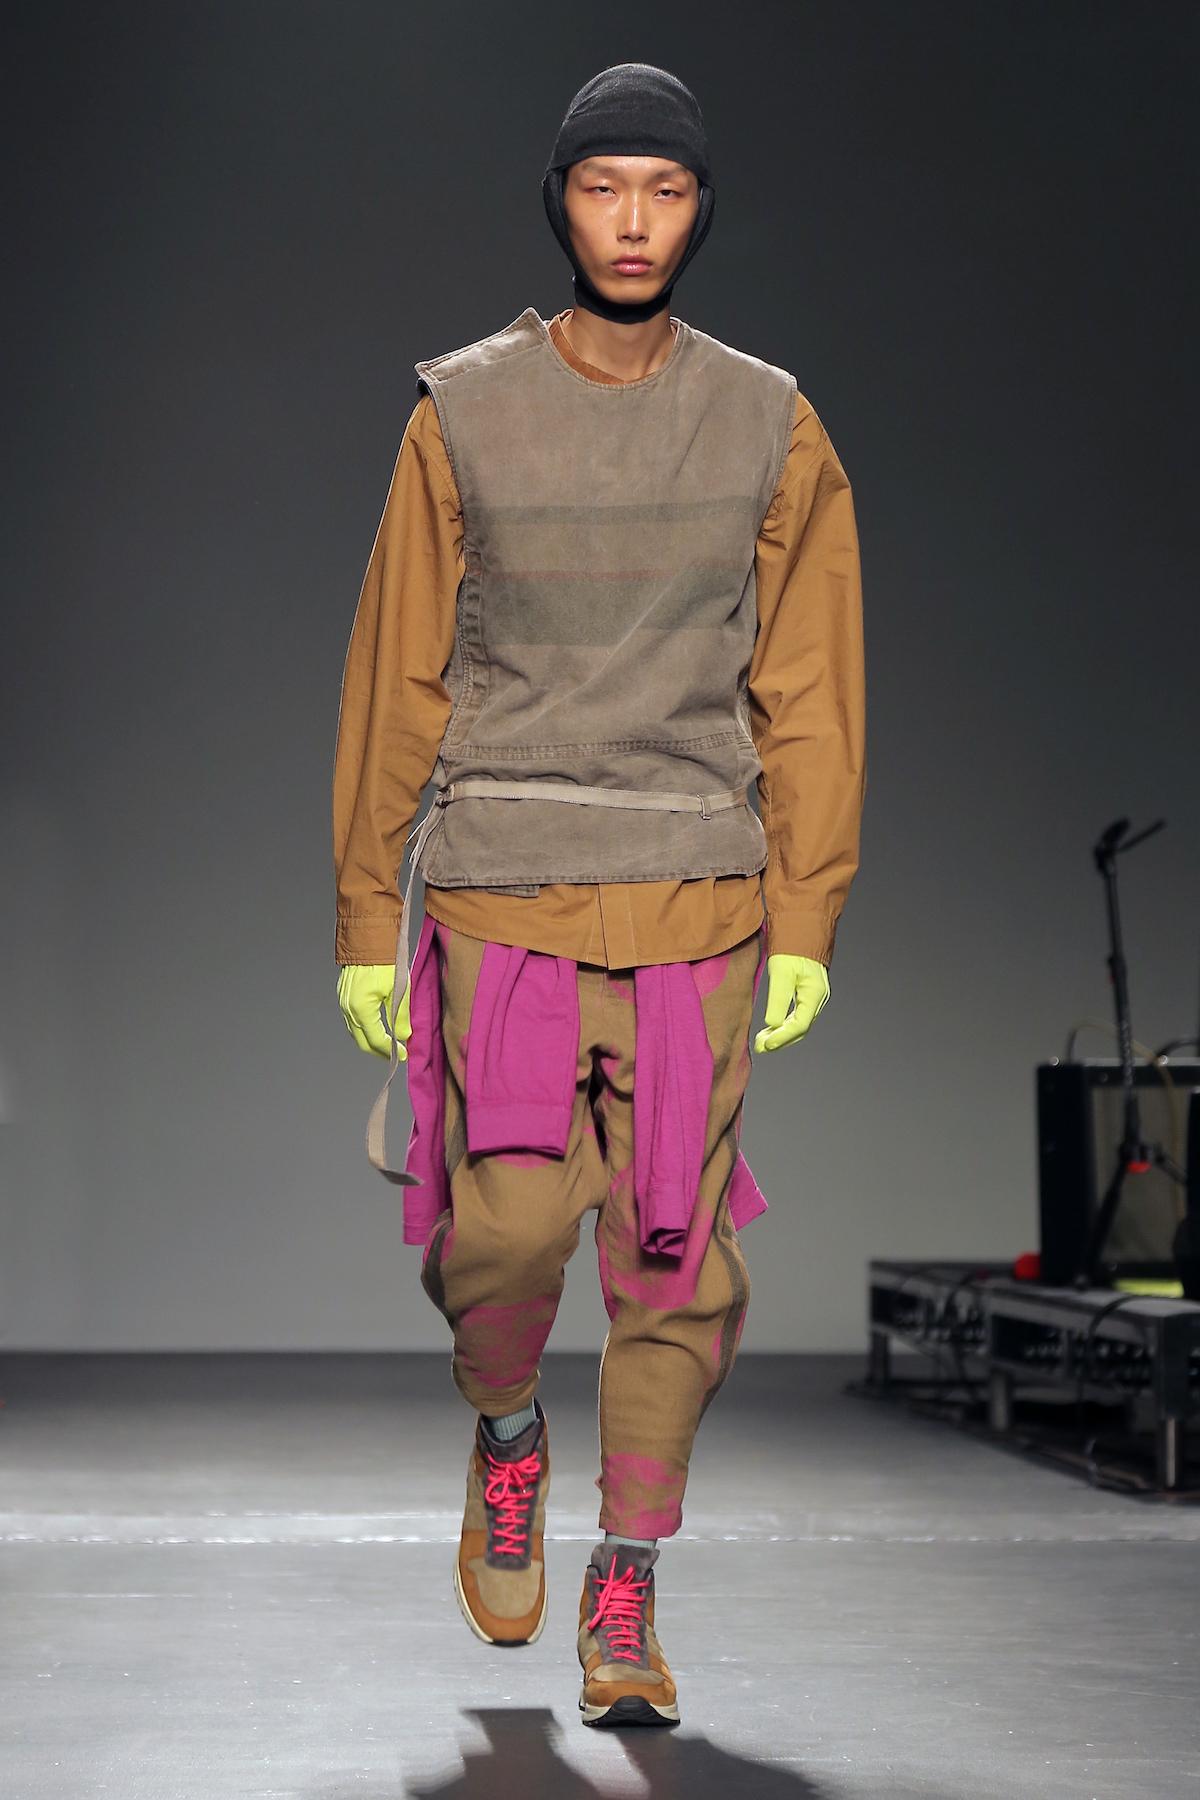 Fashion's New Cutting Edge Looks Courtesy of Men's Fashion Week